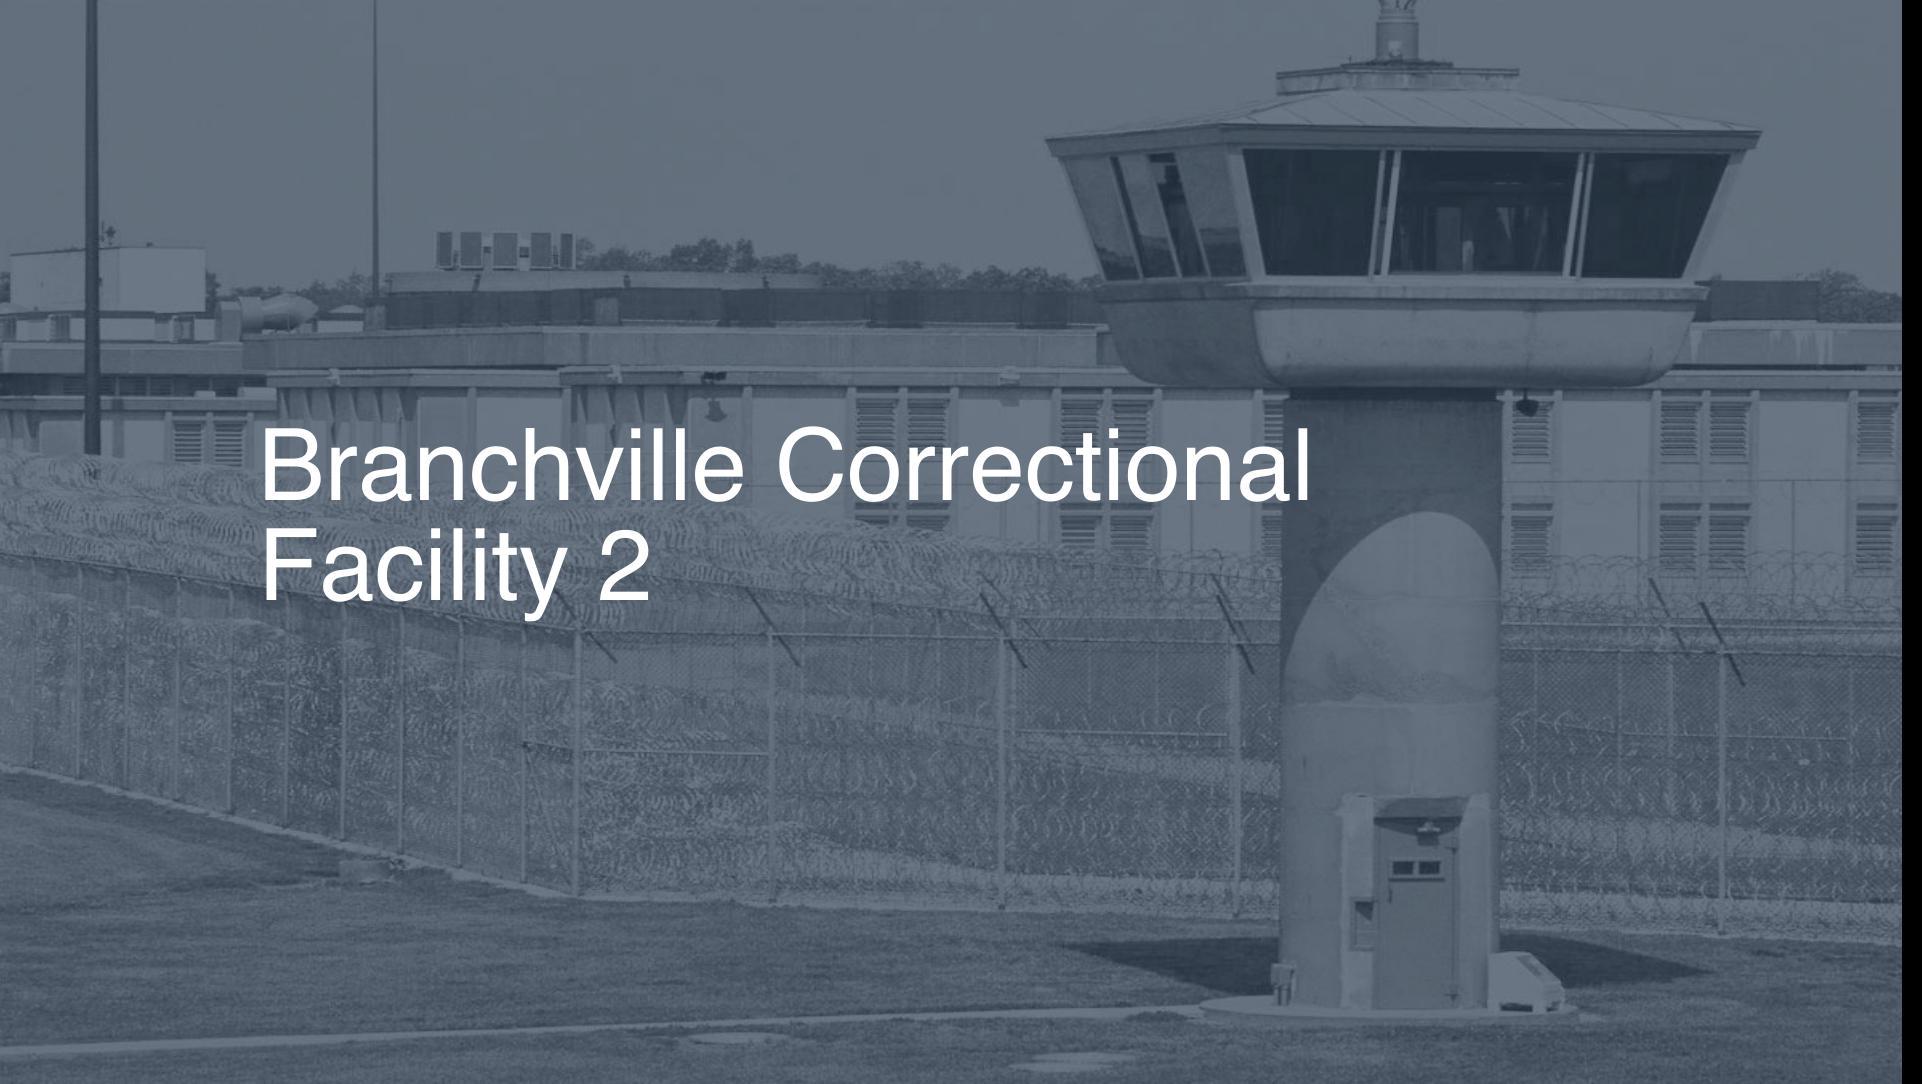 Branchville Correctional Facility correctional facility picture